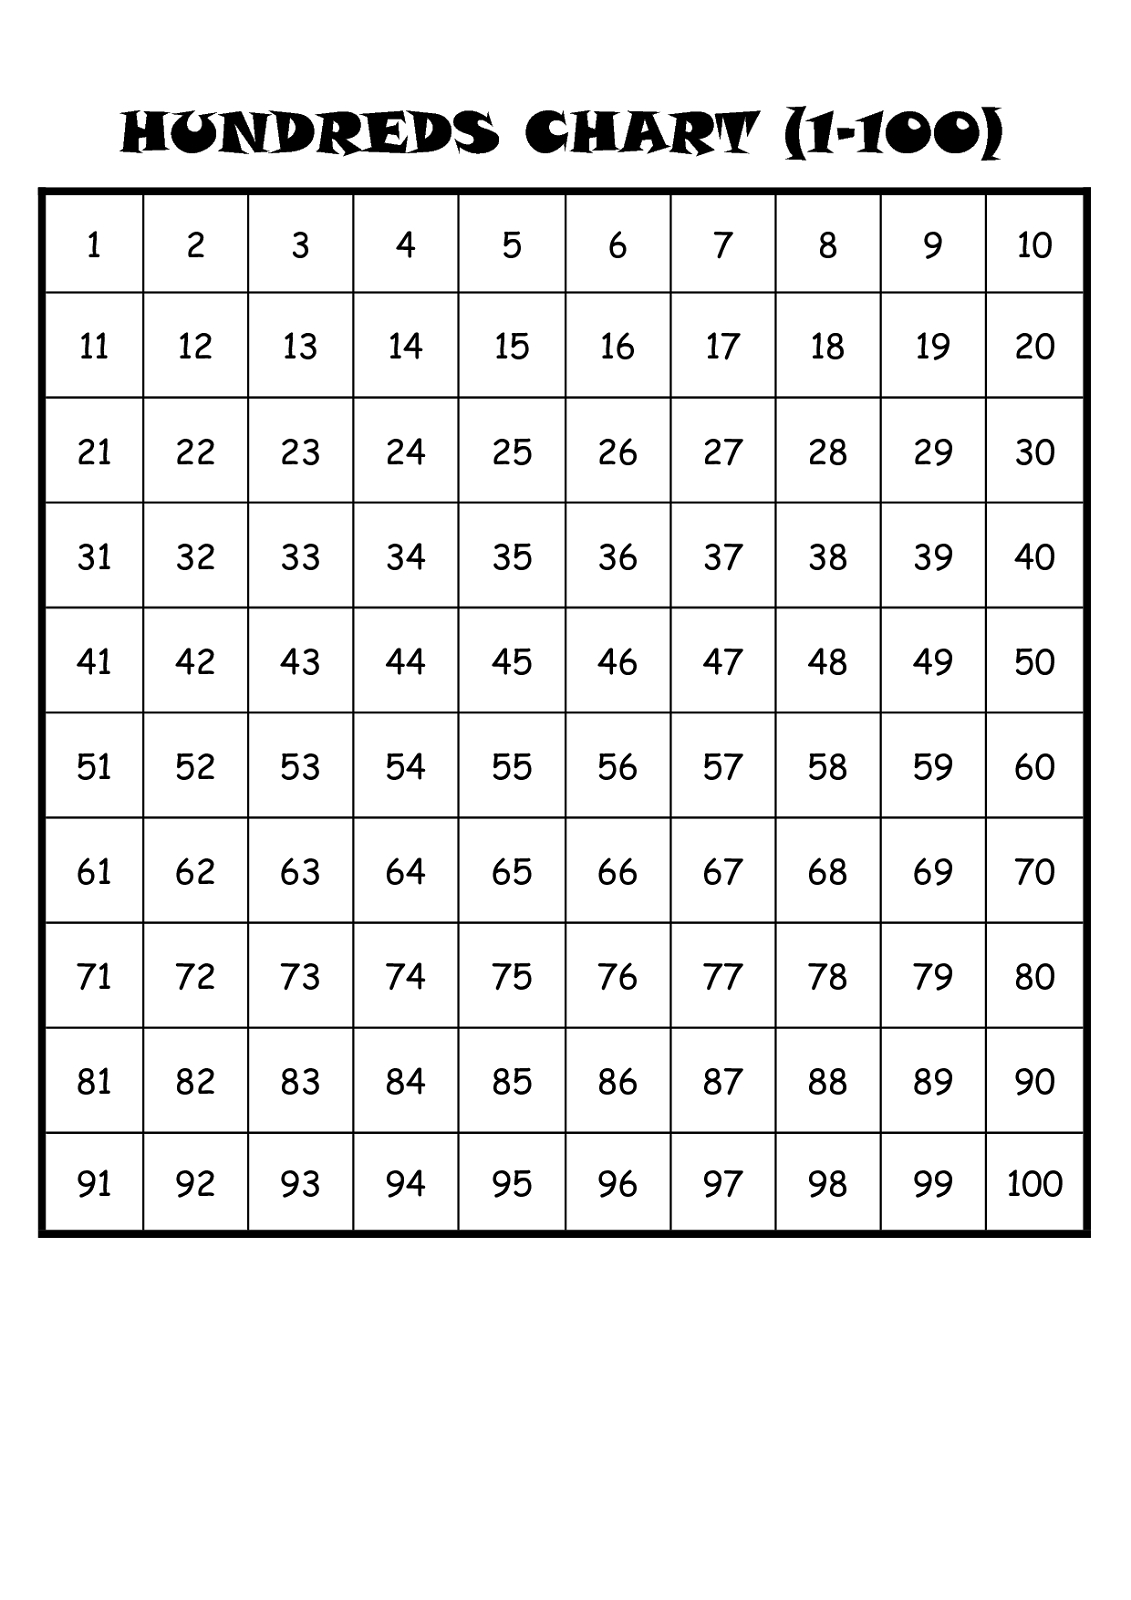 Number Sheet 1-100 To Print   Math Worksheets For Kids   Kids Math - Free Printable Number Worksheets 1 100